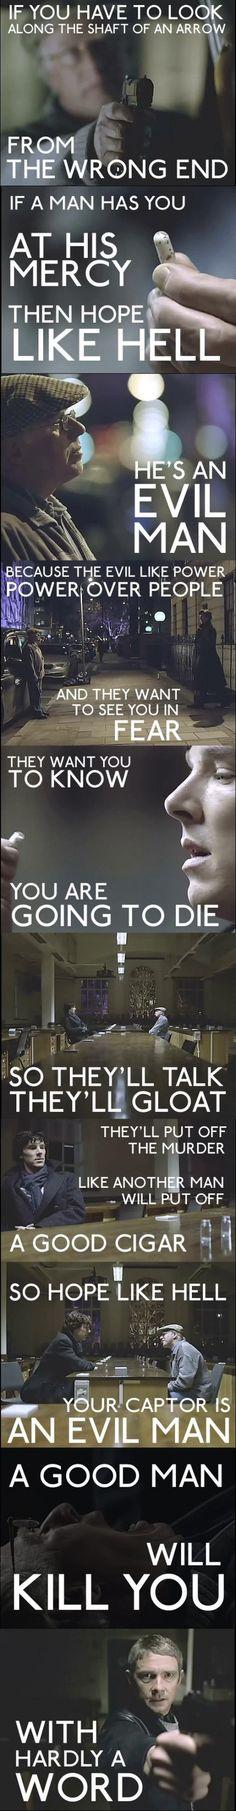 Evil Man vs. Good Man #Sherlock